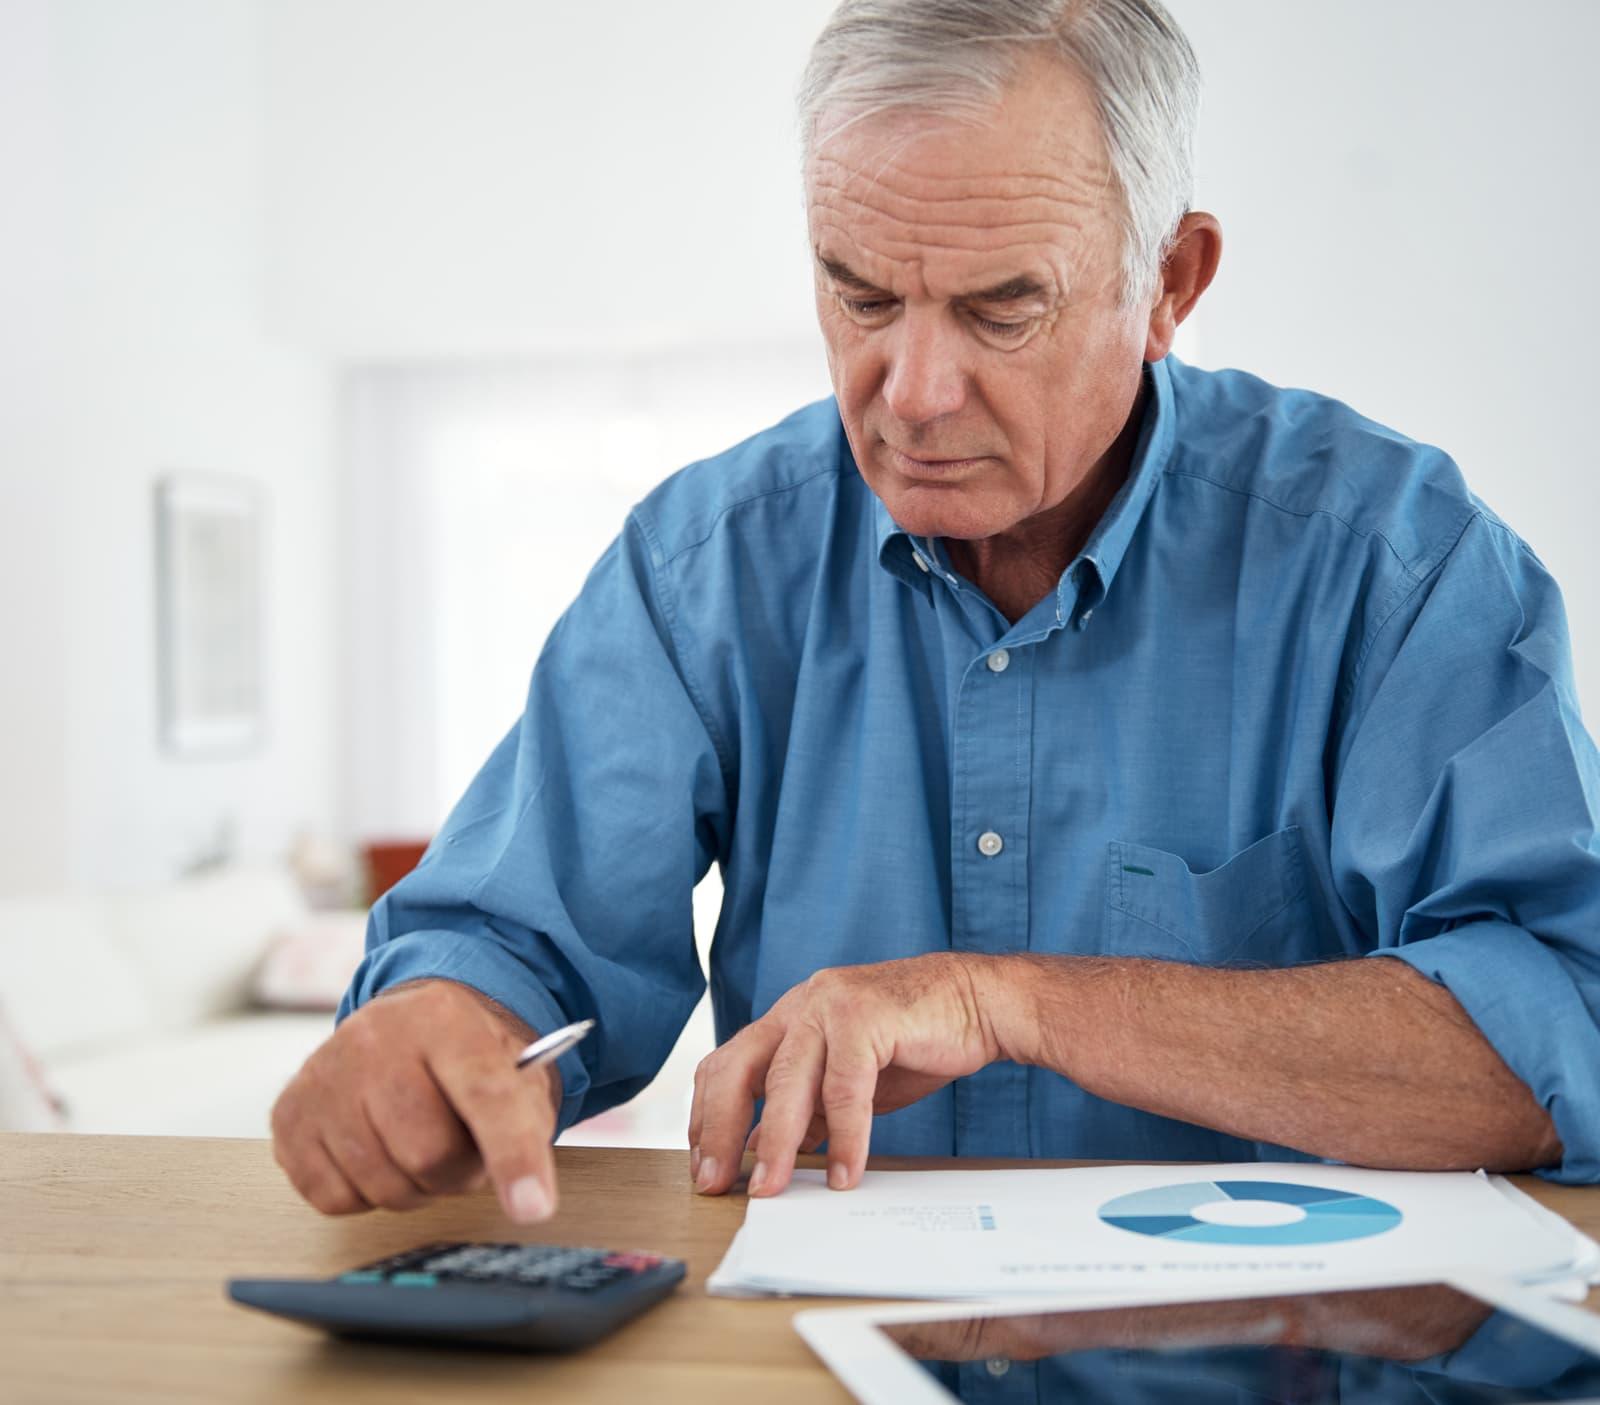 Apply Wells Fargo Small Business Credit